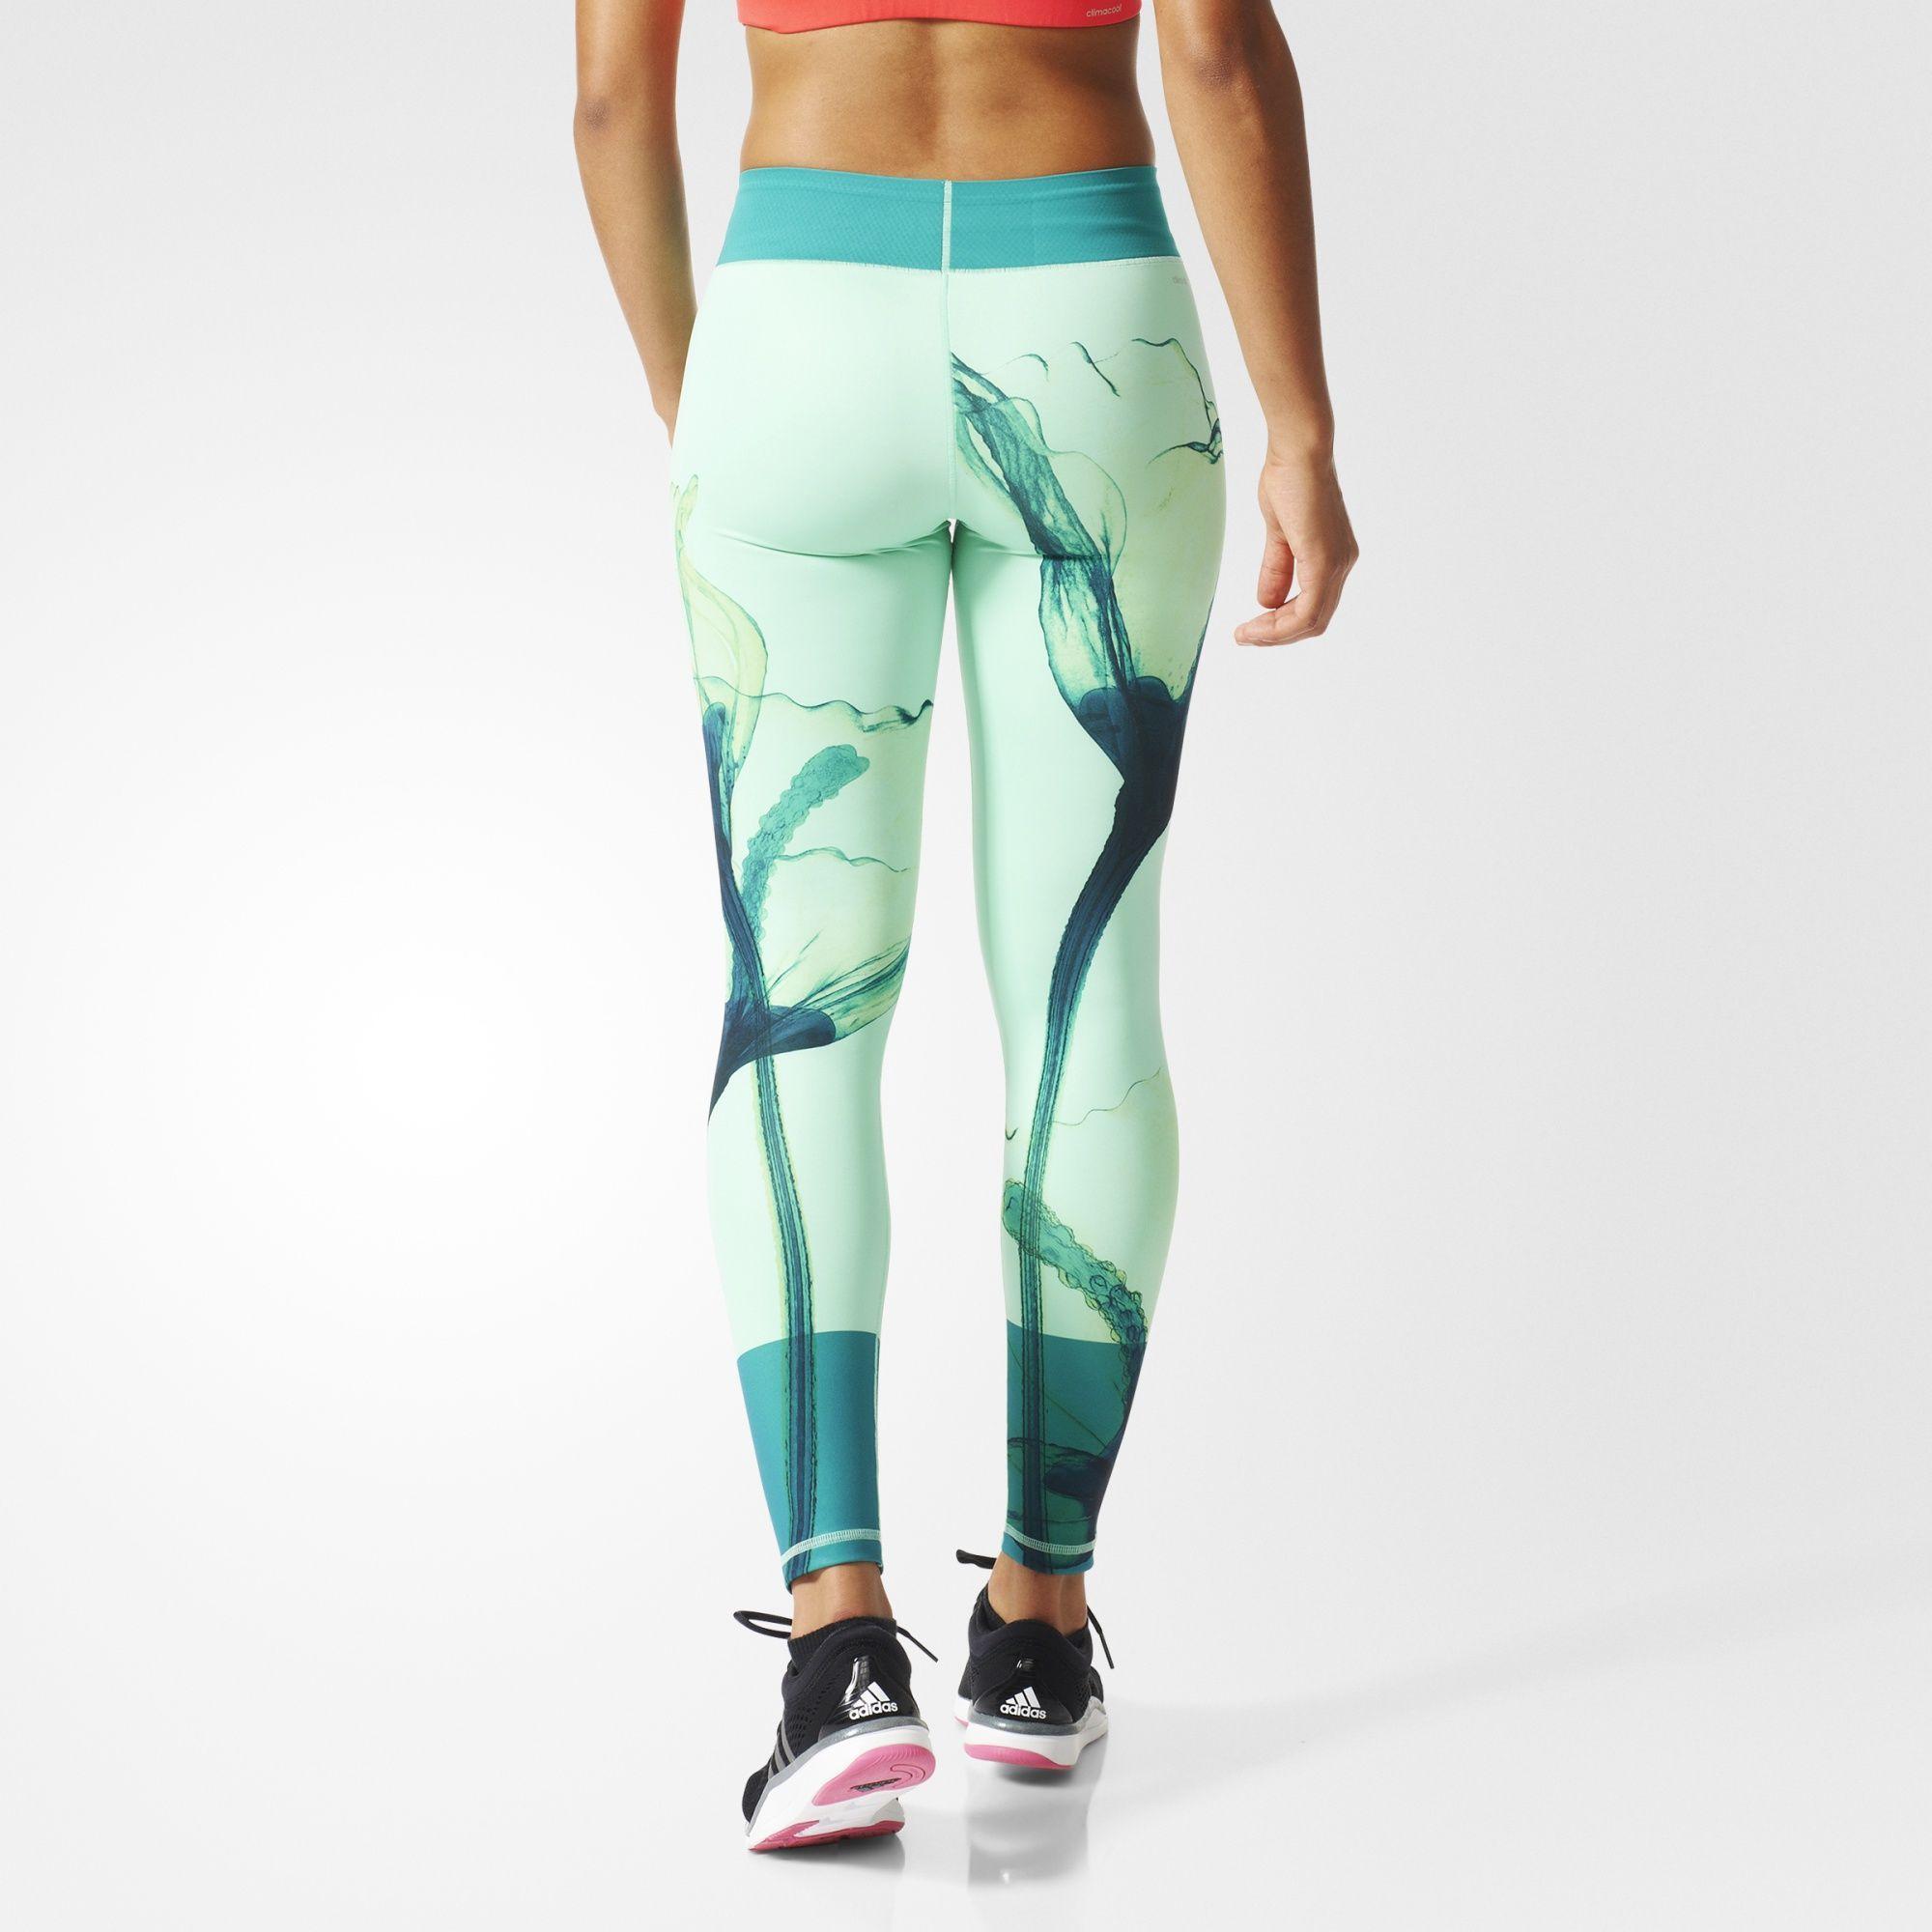 Adidas Oceania Womens running pants, Womens tights